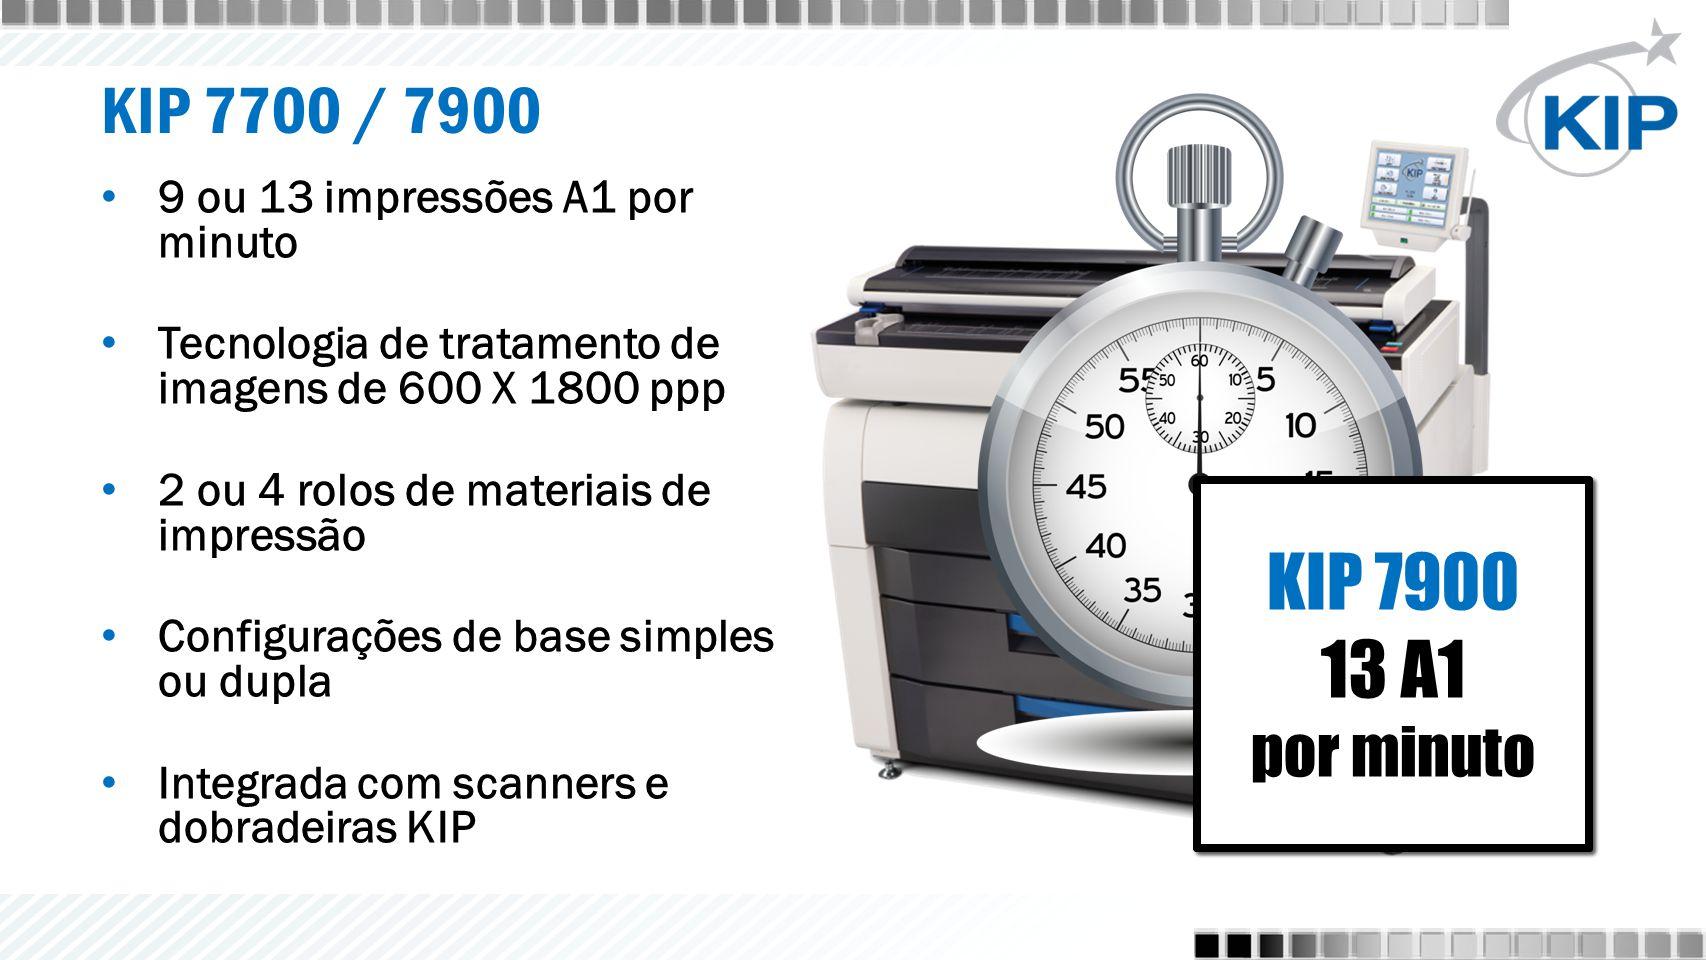 KIP 7700 9 A1 por minuto KIP 7700 9 A1 por minuto KIP 7900 13 A1 por minuto KIP 7900 13 A1 por minuto KIP 7700 / 7900 9 ou 13 impressões A1 por minuto